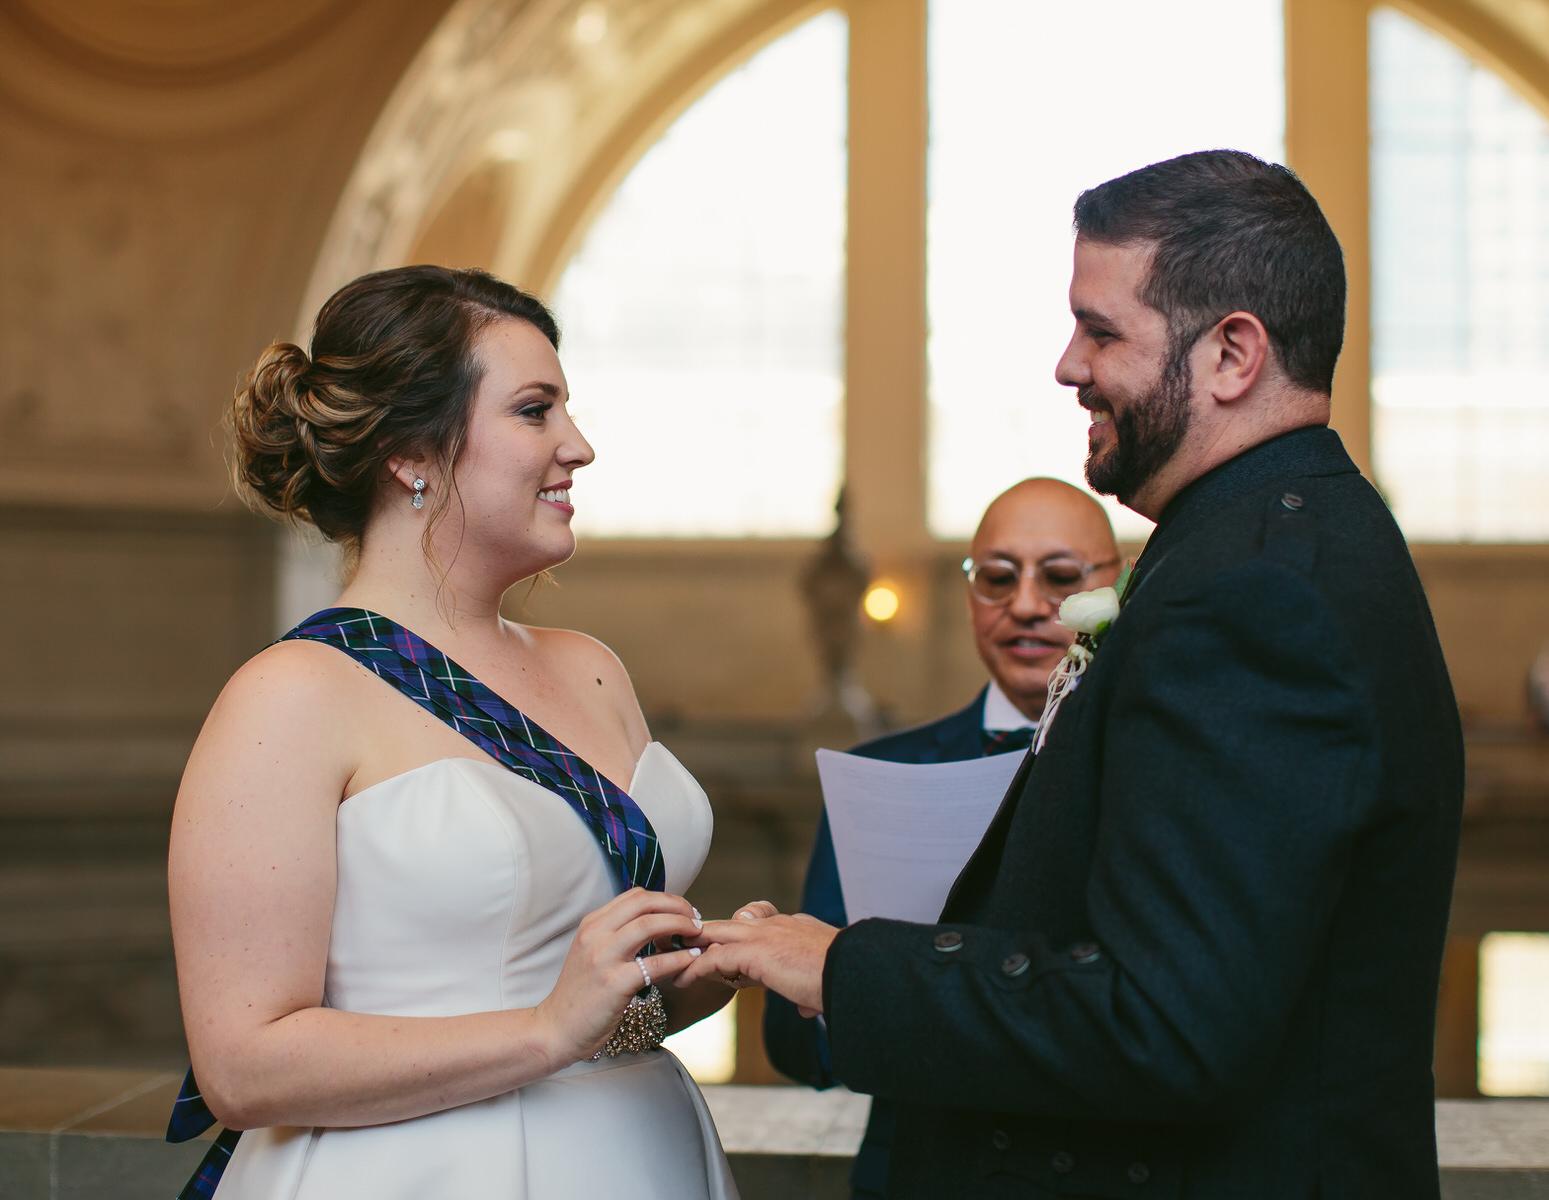 san-francisco-city-hall-wedding-steph-lynn-photo-111.jpg